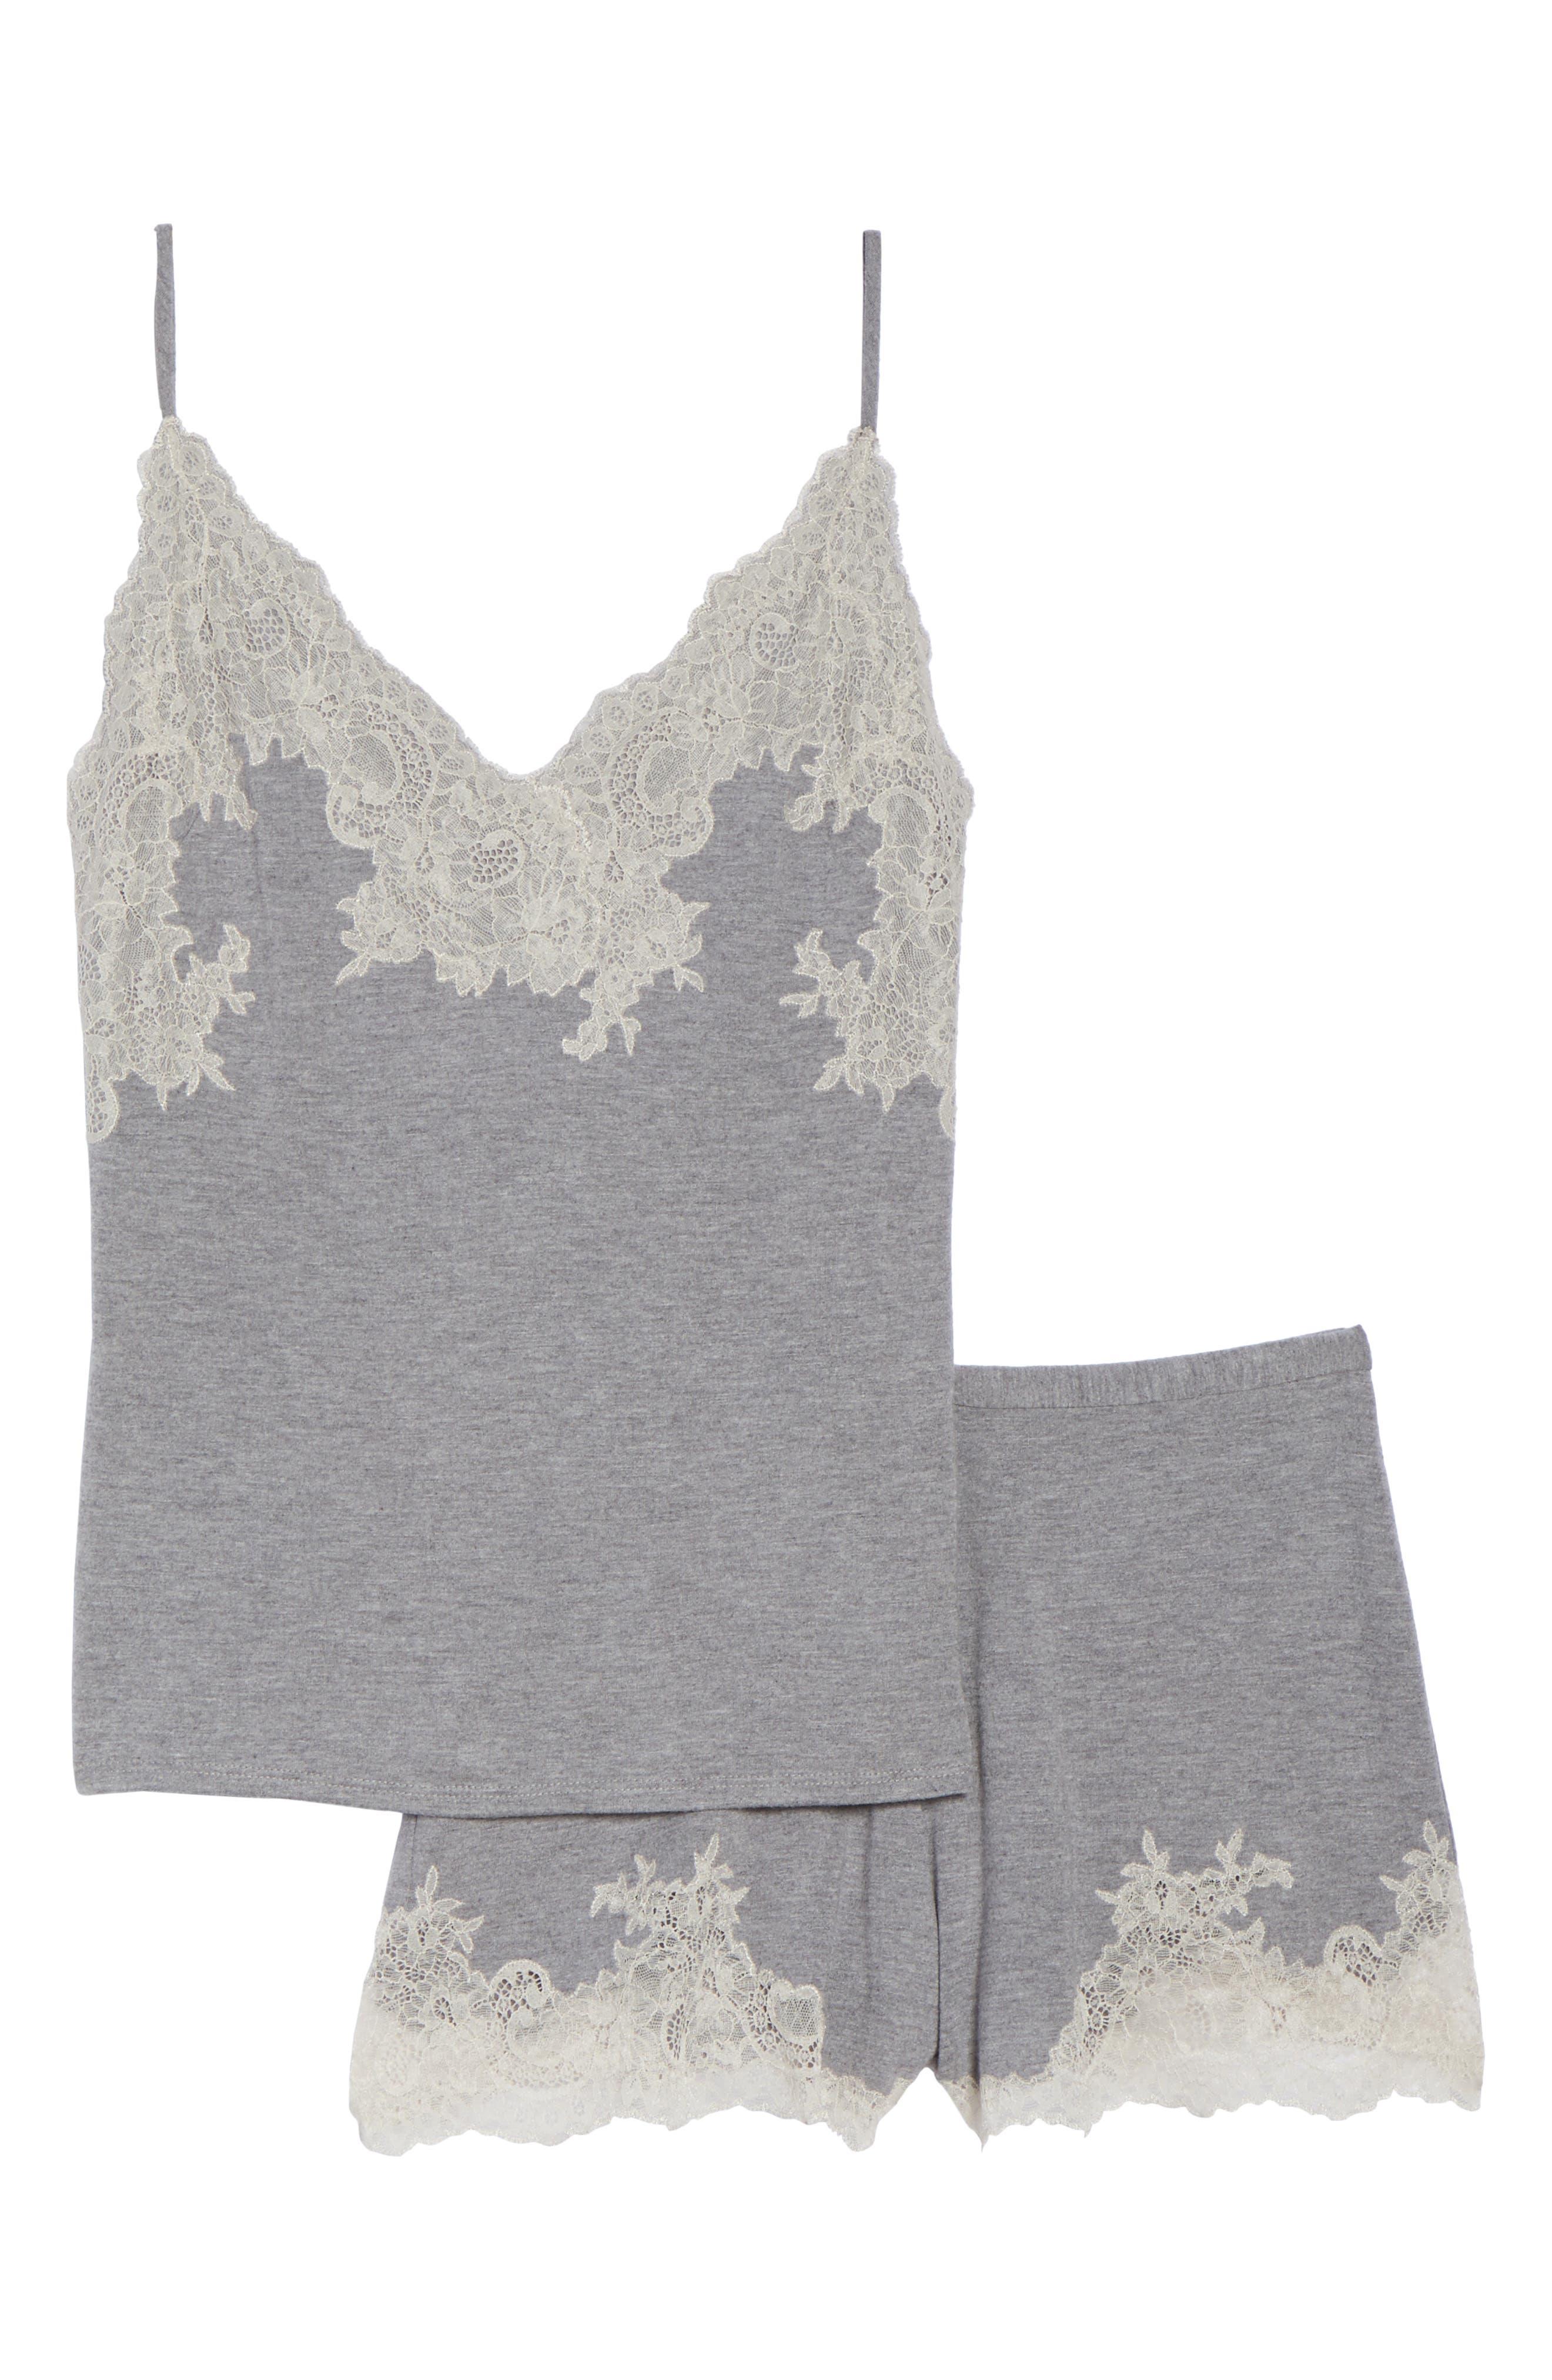 NATORI, Luxe Shangri-La Short Pajamas, Alternate thumbnail 8, color, GREY